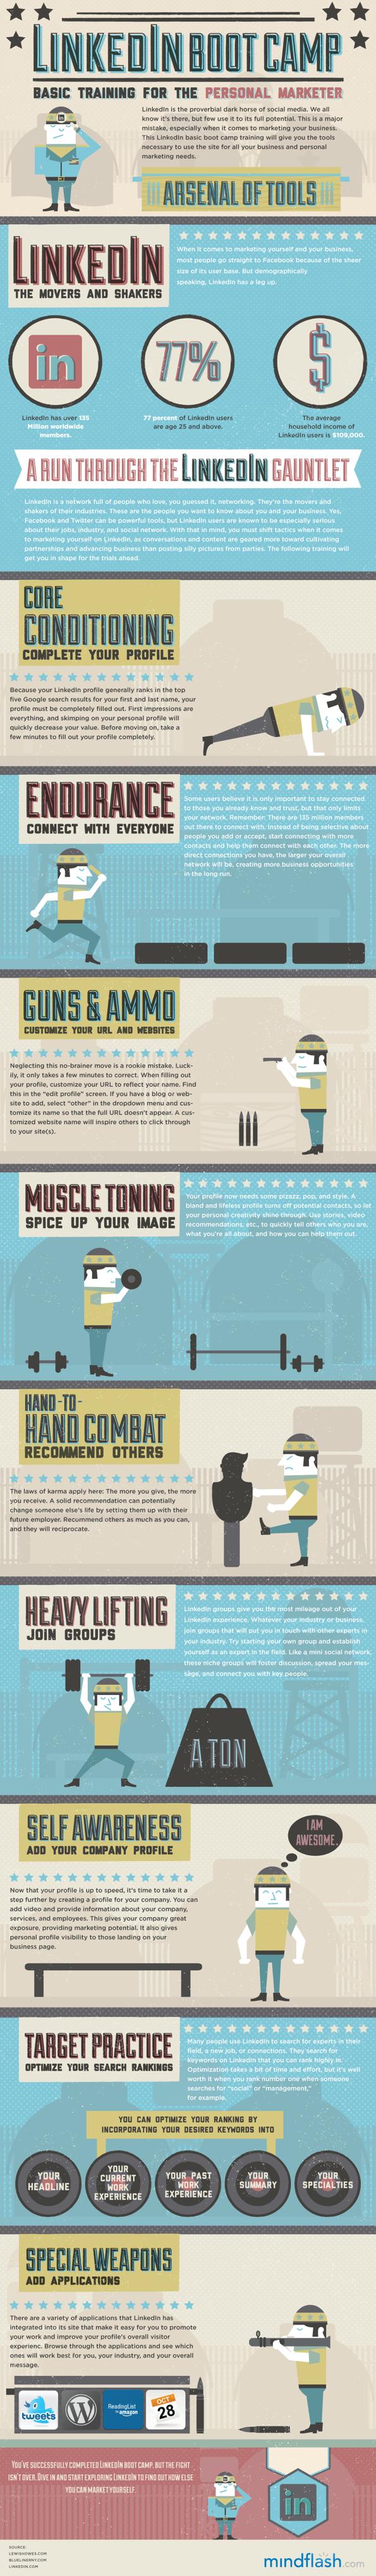 linkedin-Bootcamp-basic-training-infographic